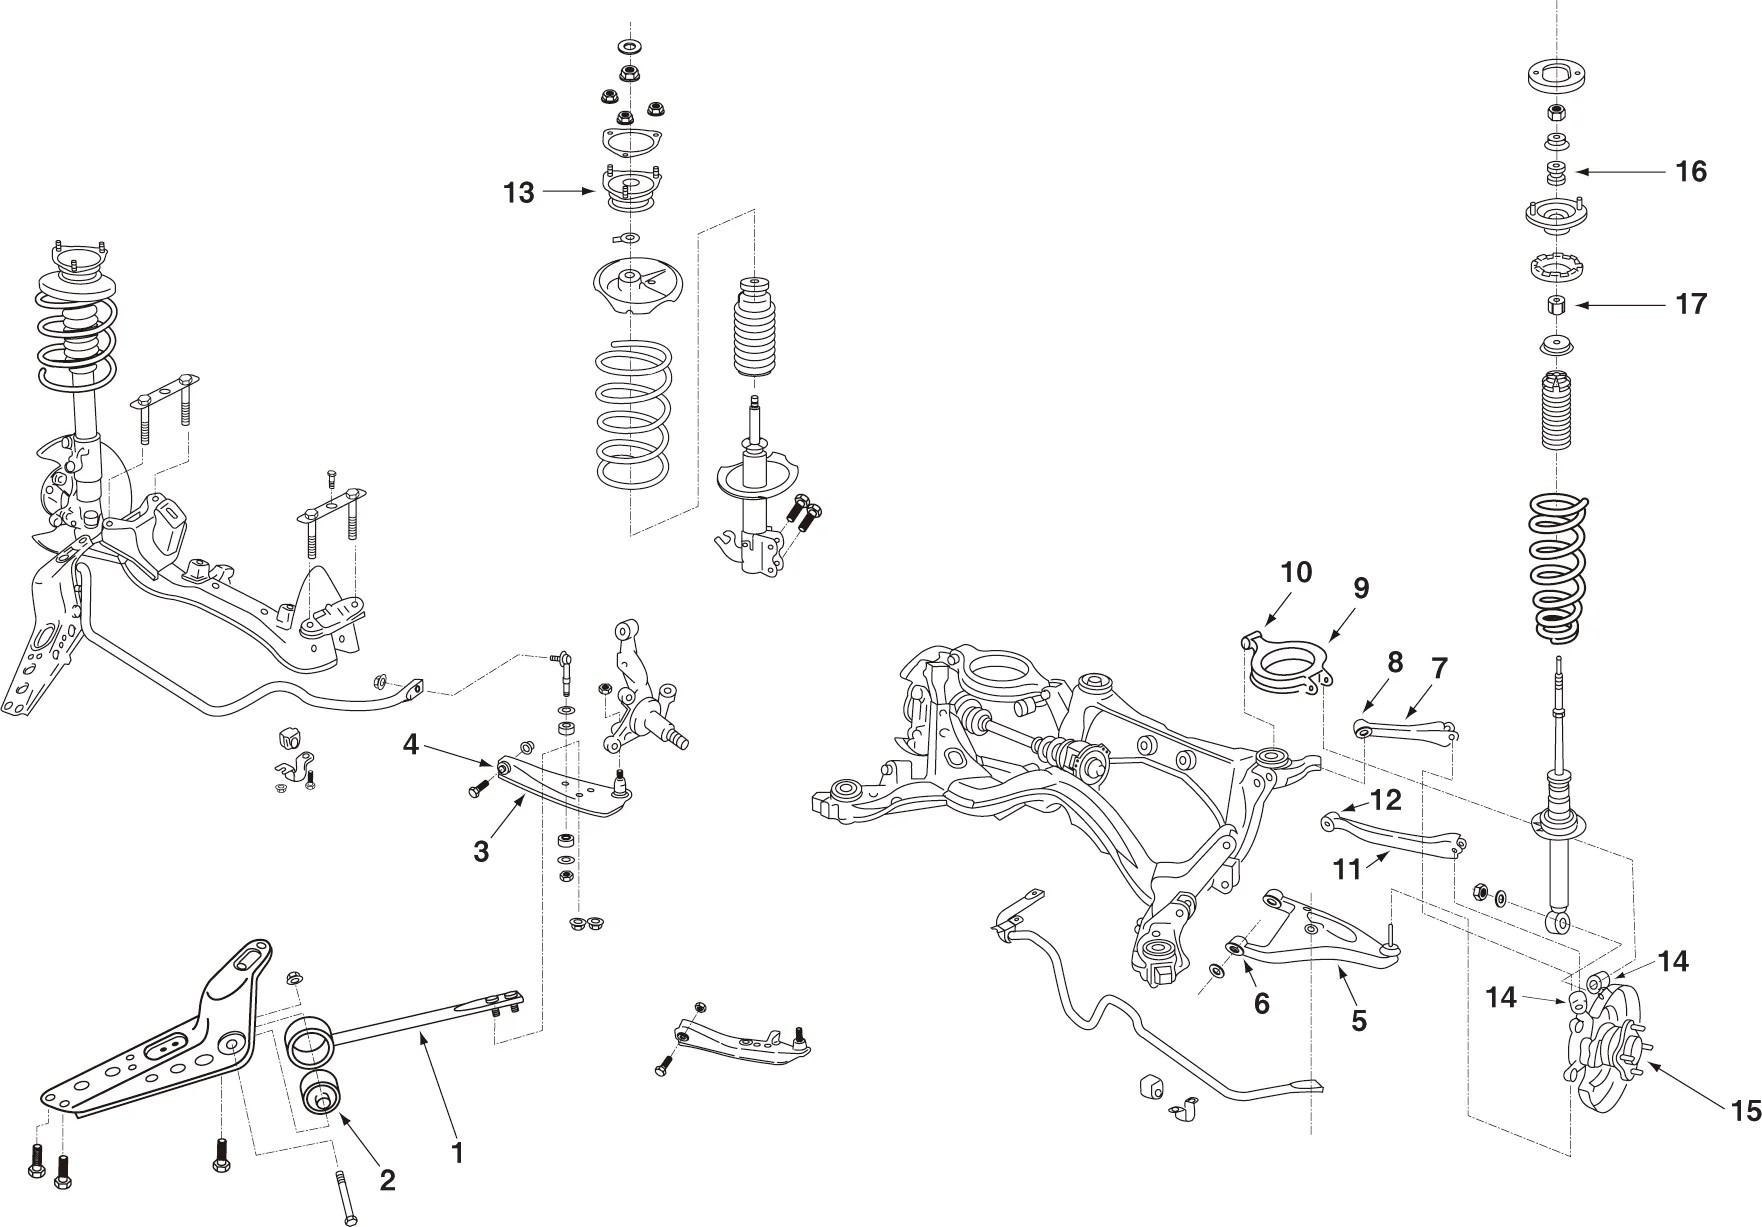 medium resolution of nismo rear lower link bush for laurel c33 cefiro a31 55157 rs580